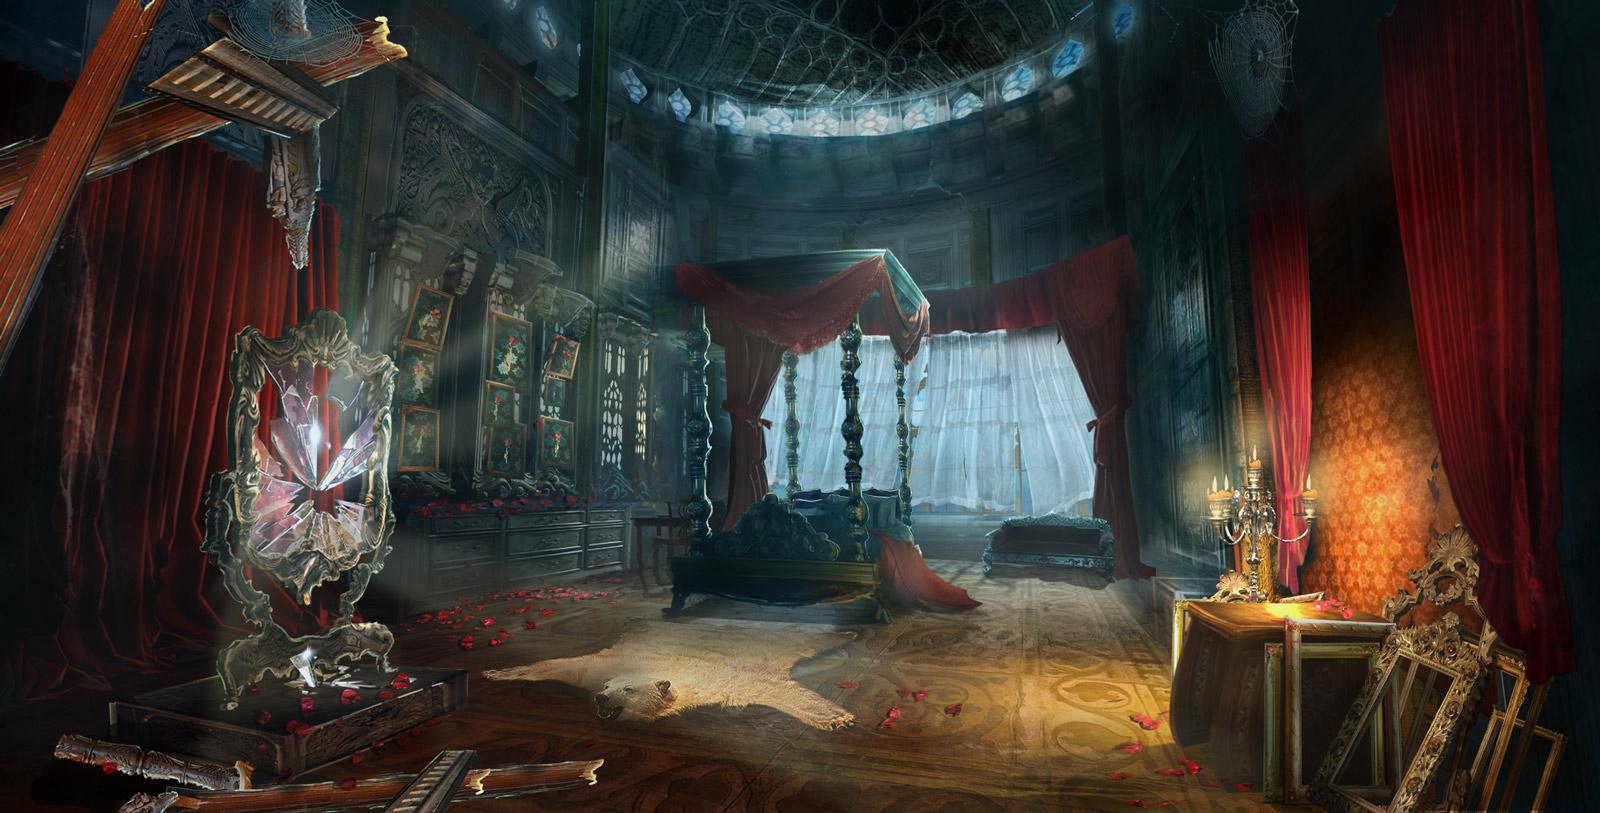 haunted mansion wallpaper desktop